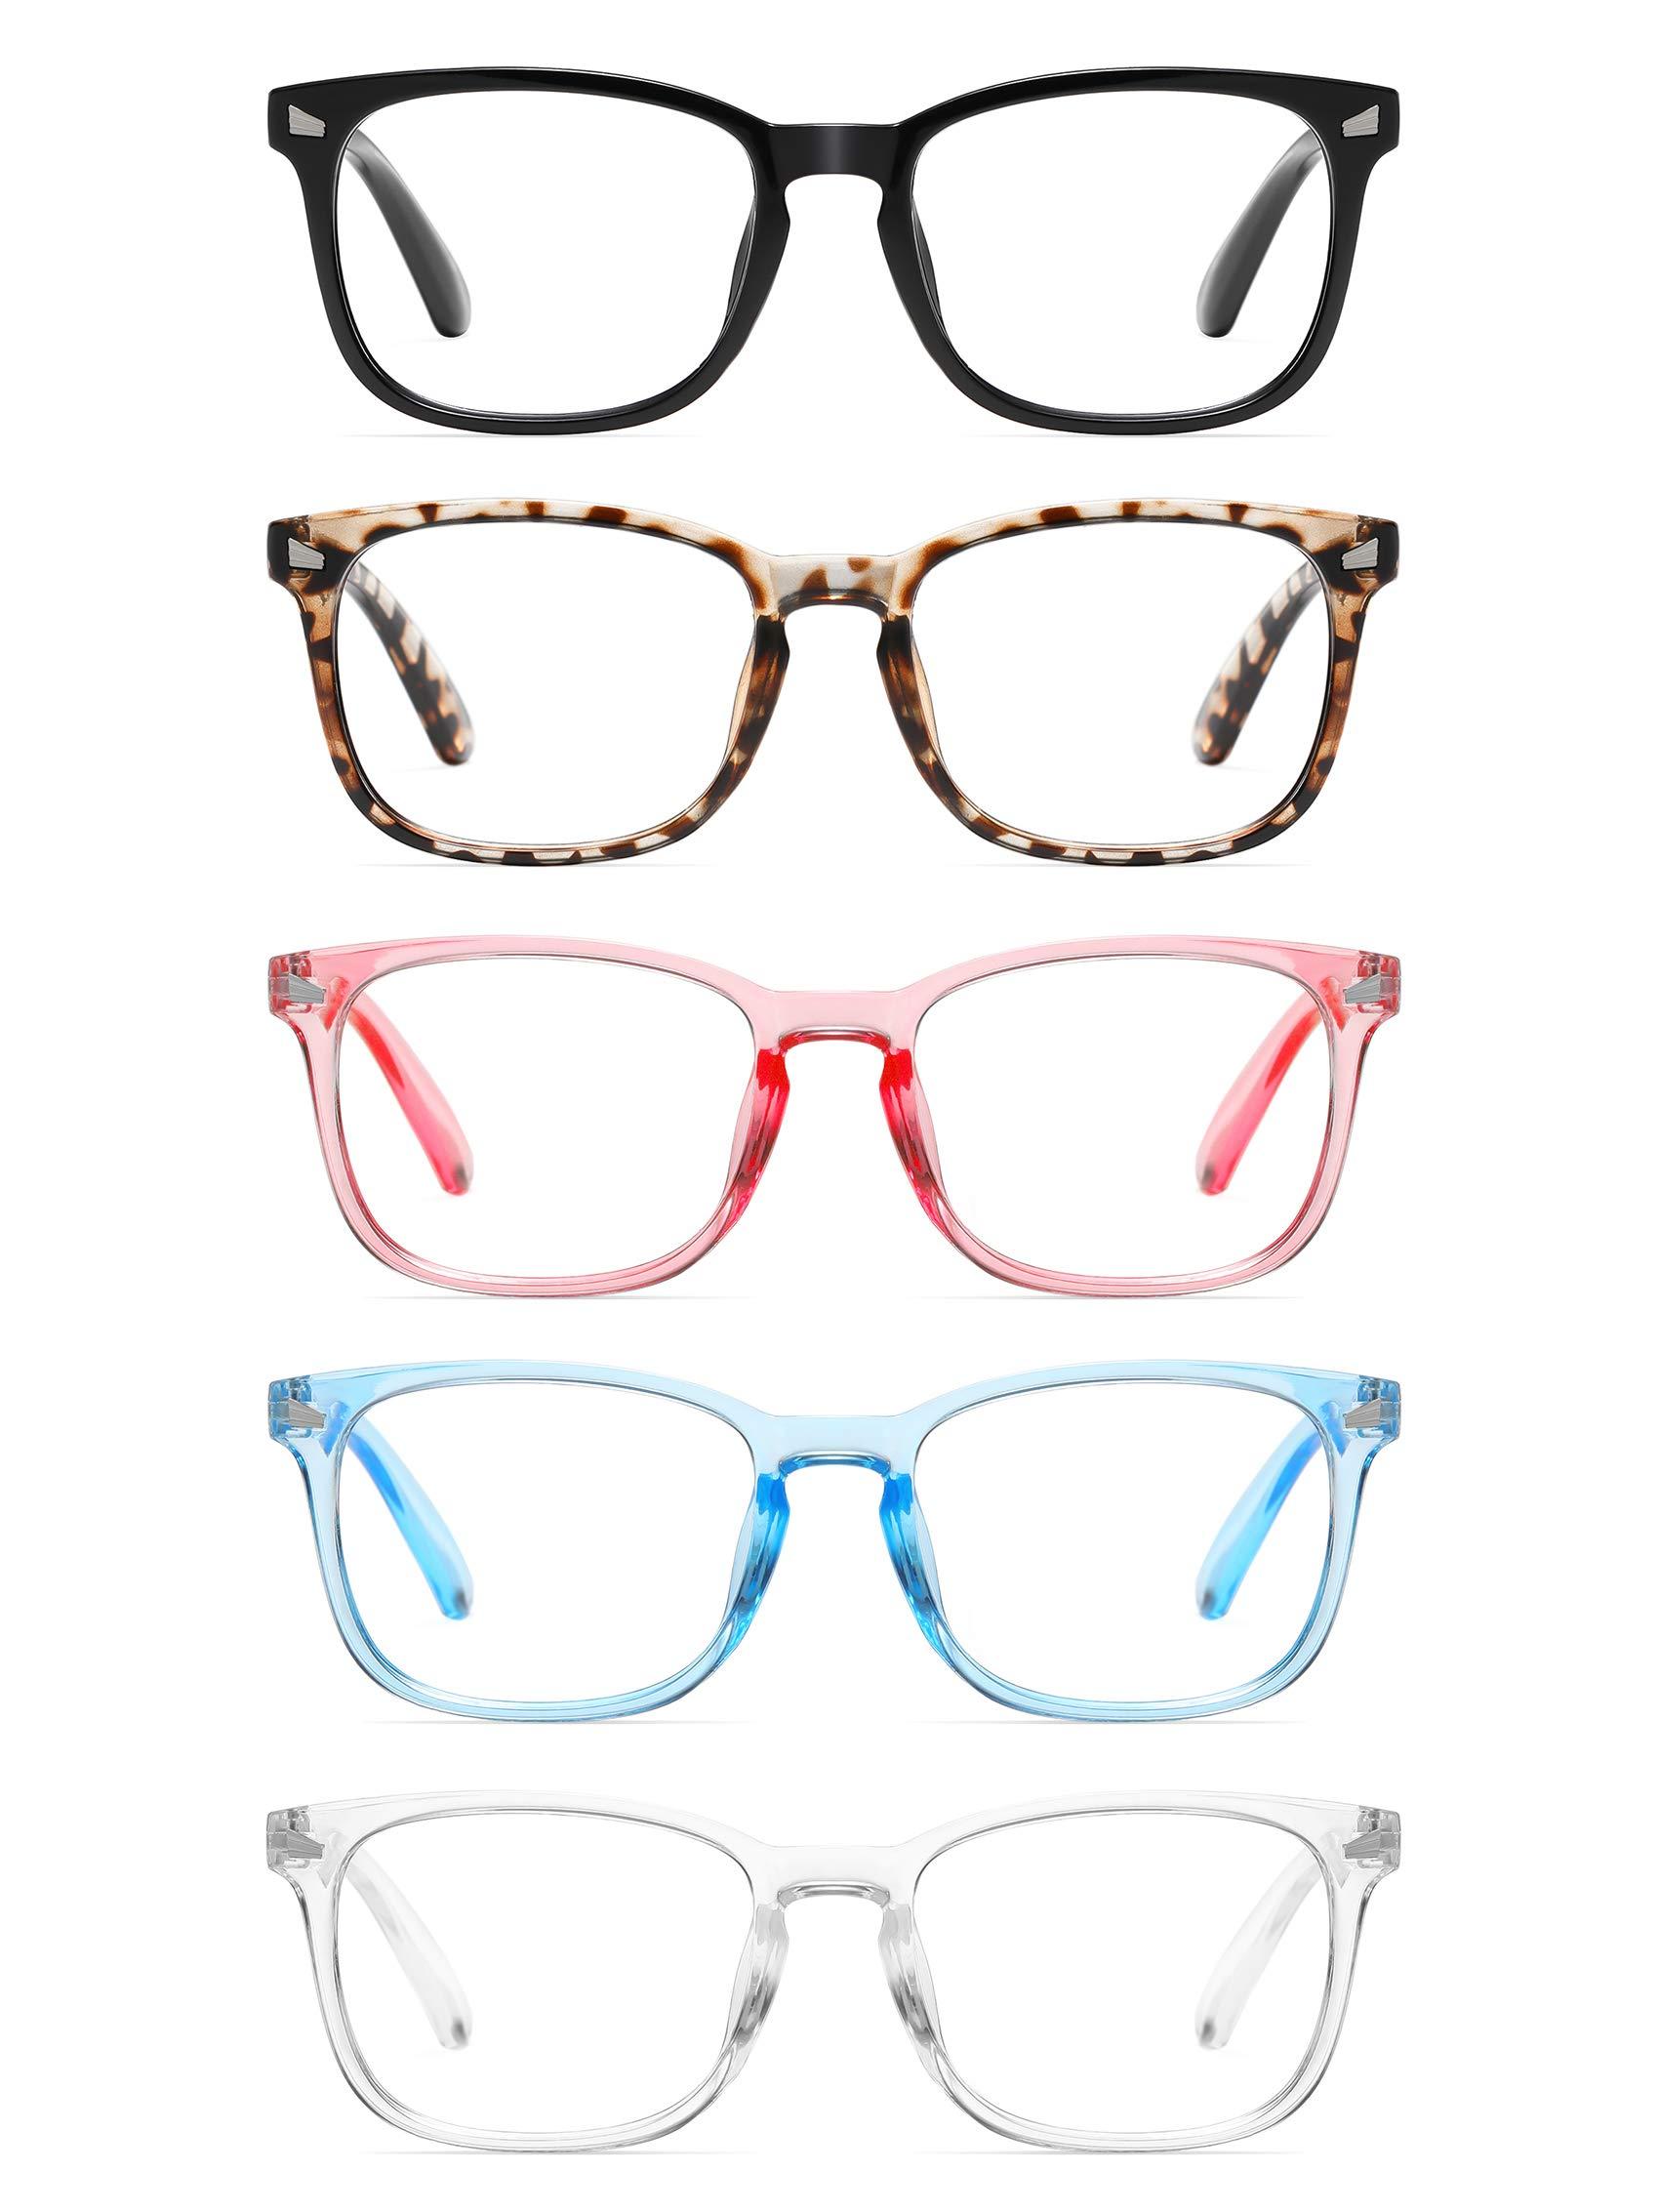 CCVOO 5 Pack Reading Glasses Blue Light Blocking, Filter UV Ray/Glare Computer Readers Fashion Nerd Eyeglasses Women/Men (C3 Mix, 3.0)